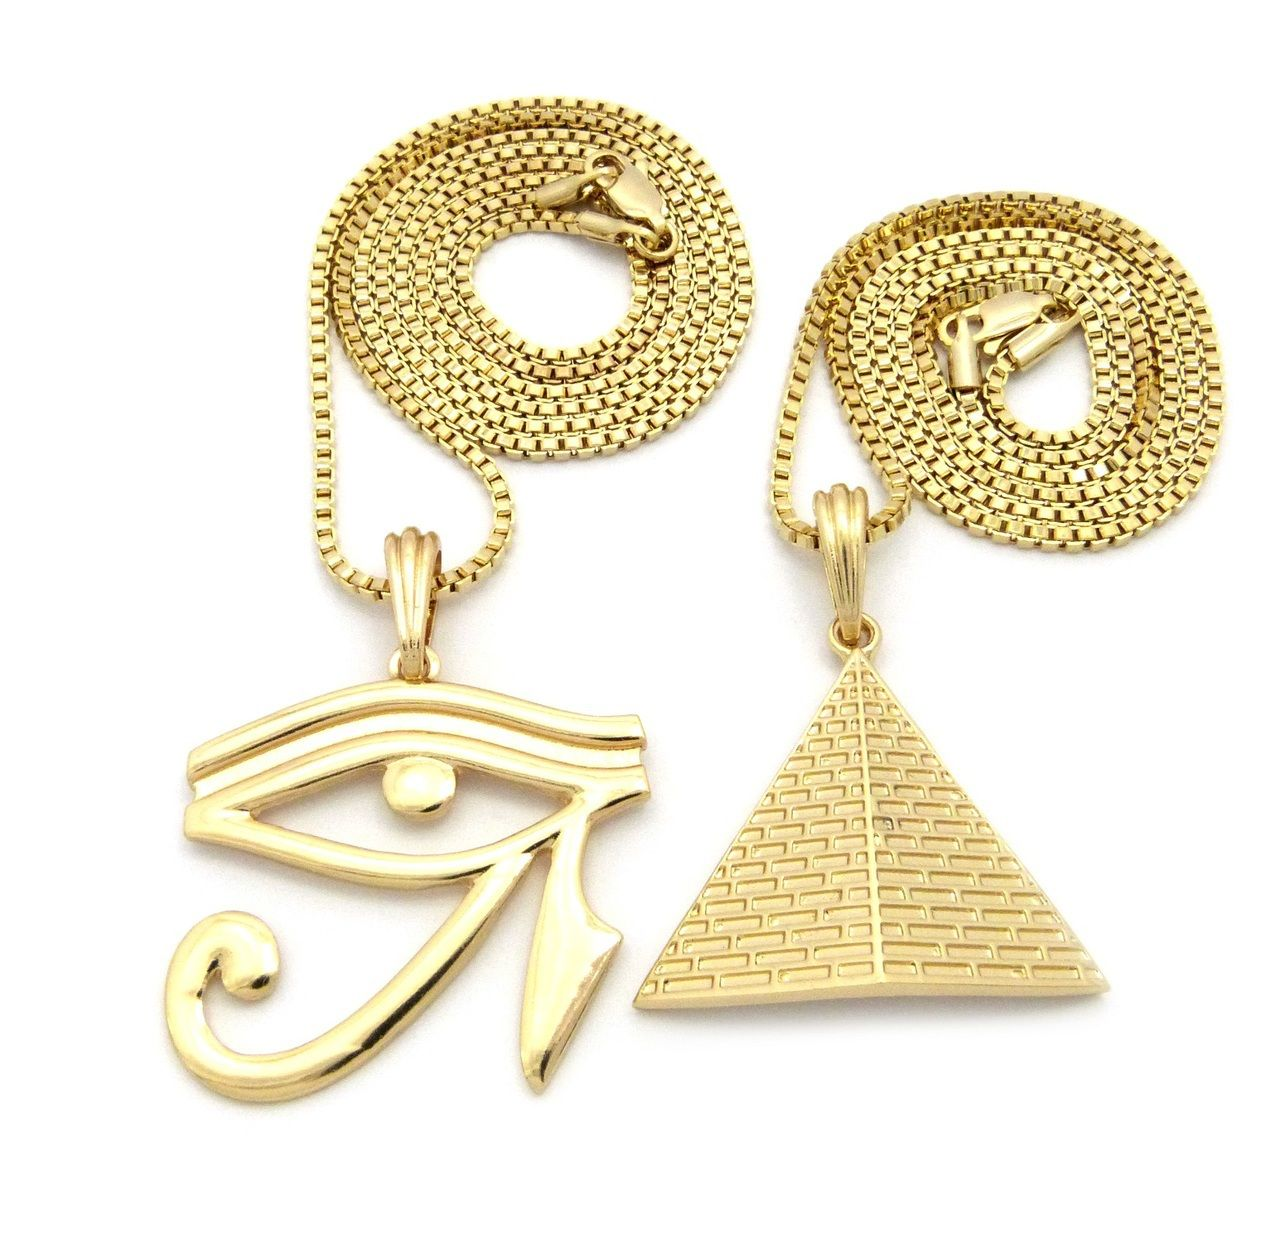 Pyramid Of Giza Eye Of Horus Egyptian Pendant Chain Necklace Set Gold - Bling Jewelz